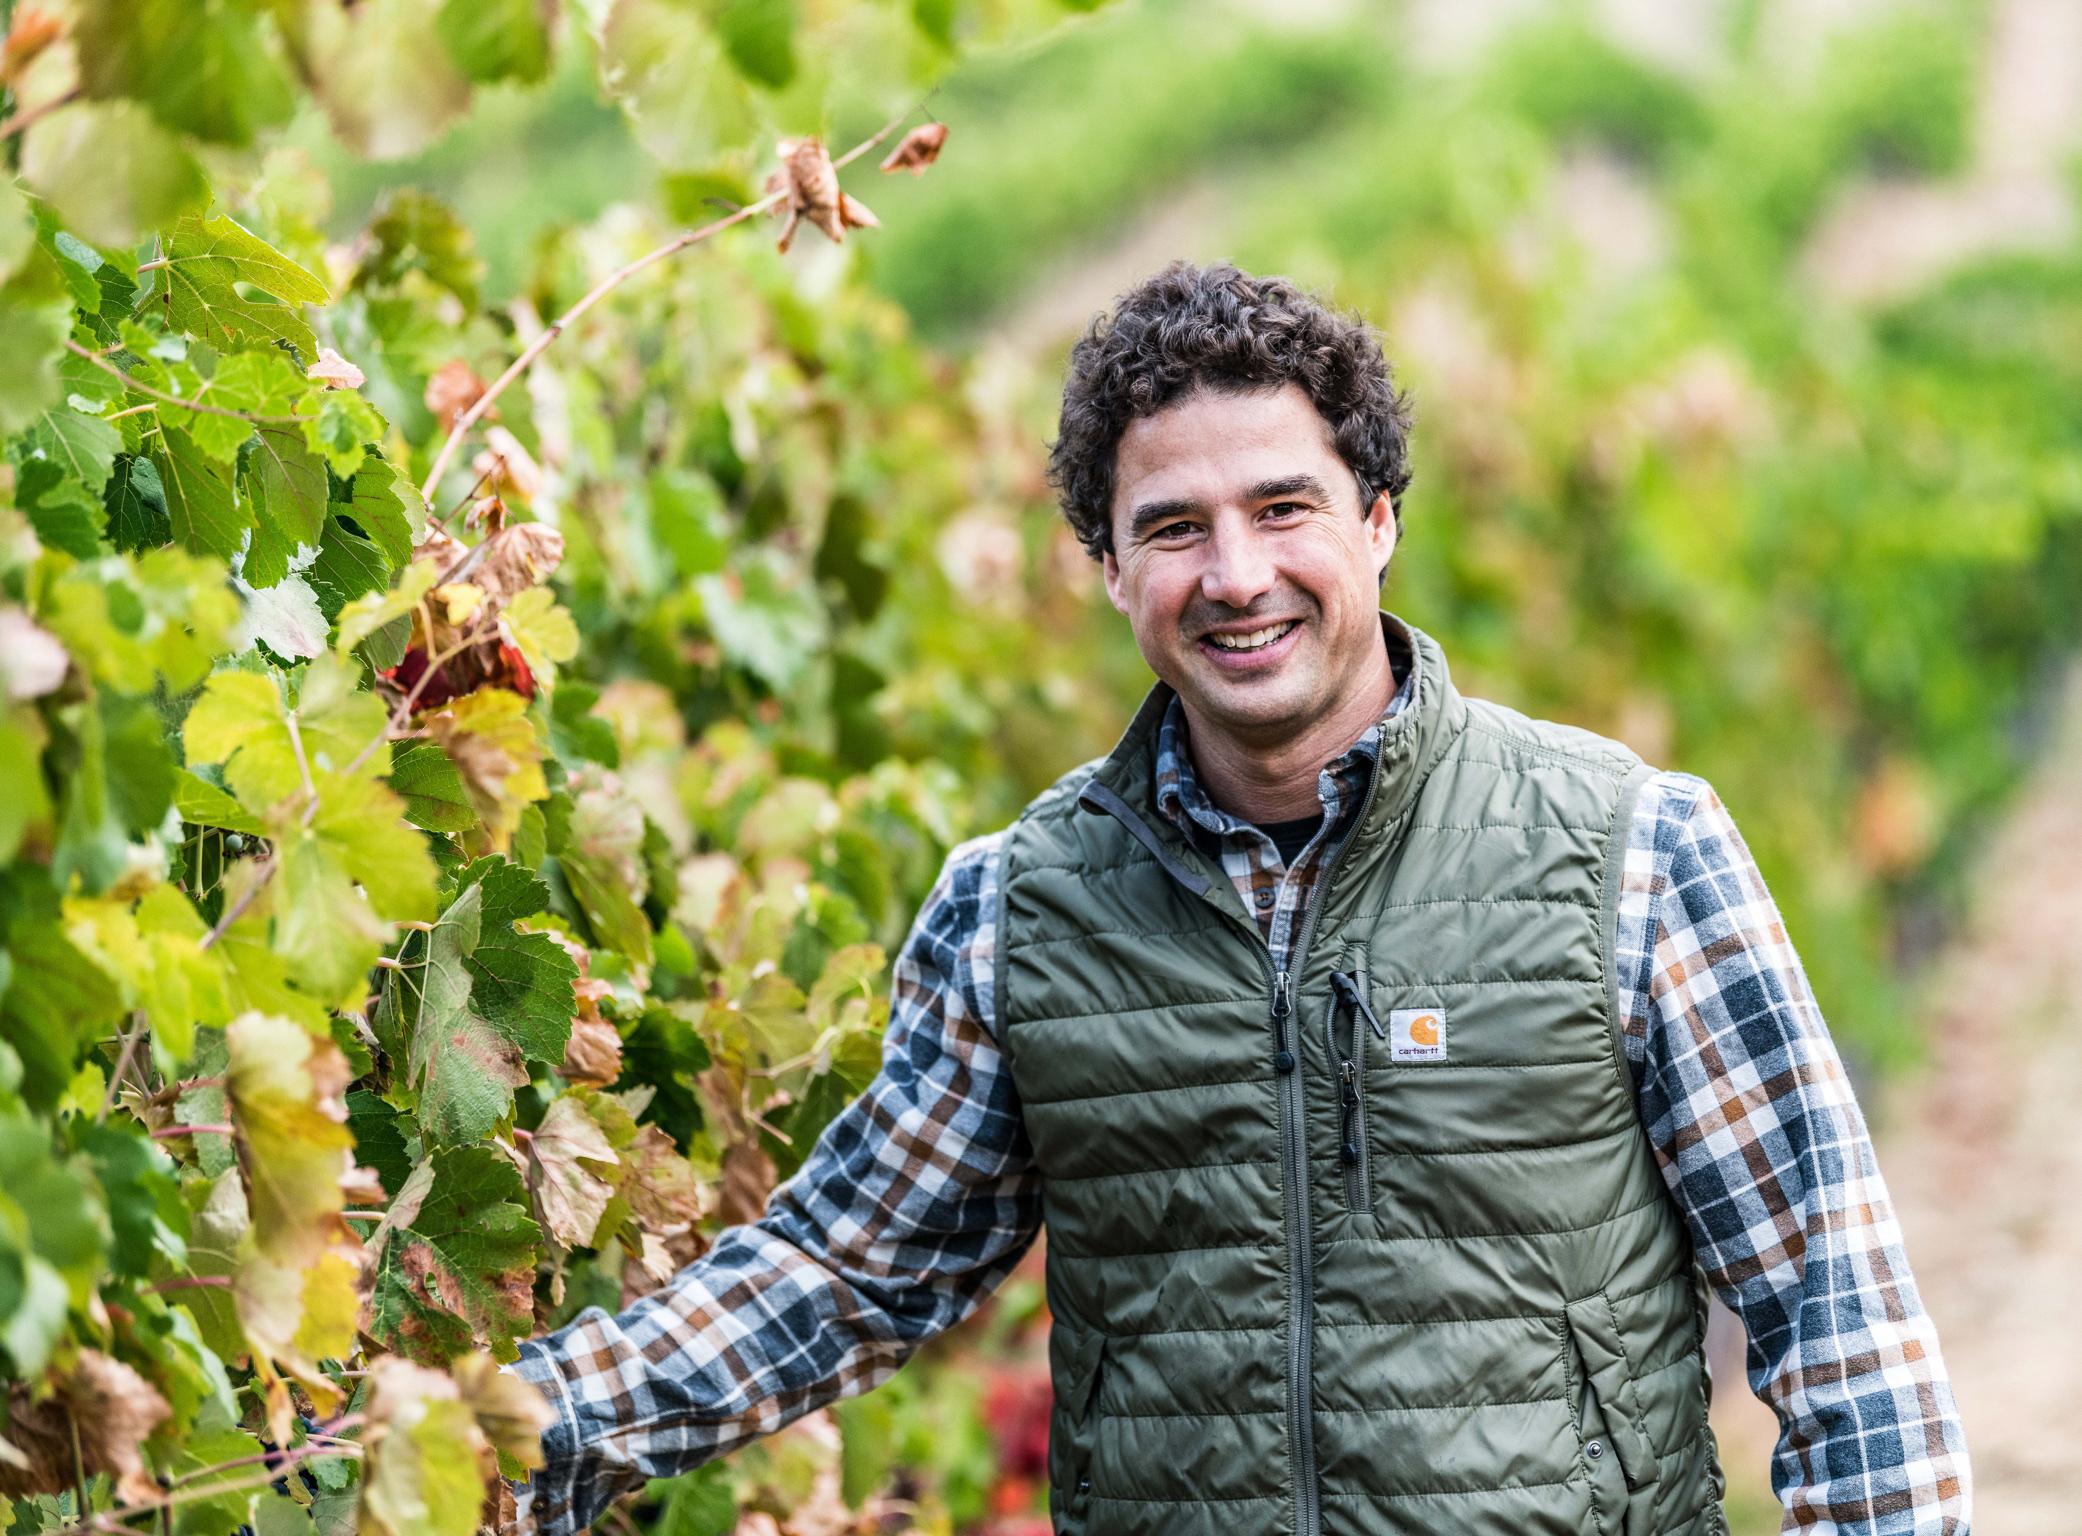 Winemaker Michael Scorsone.